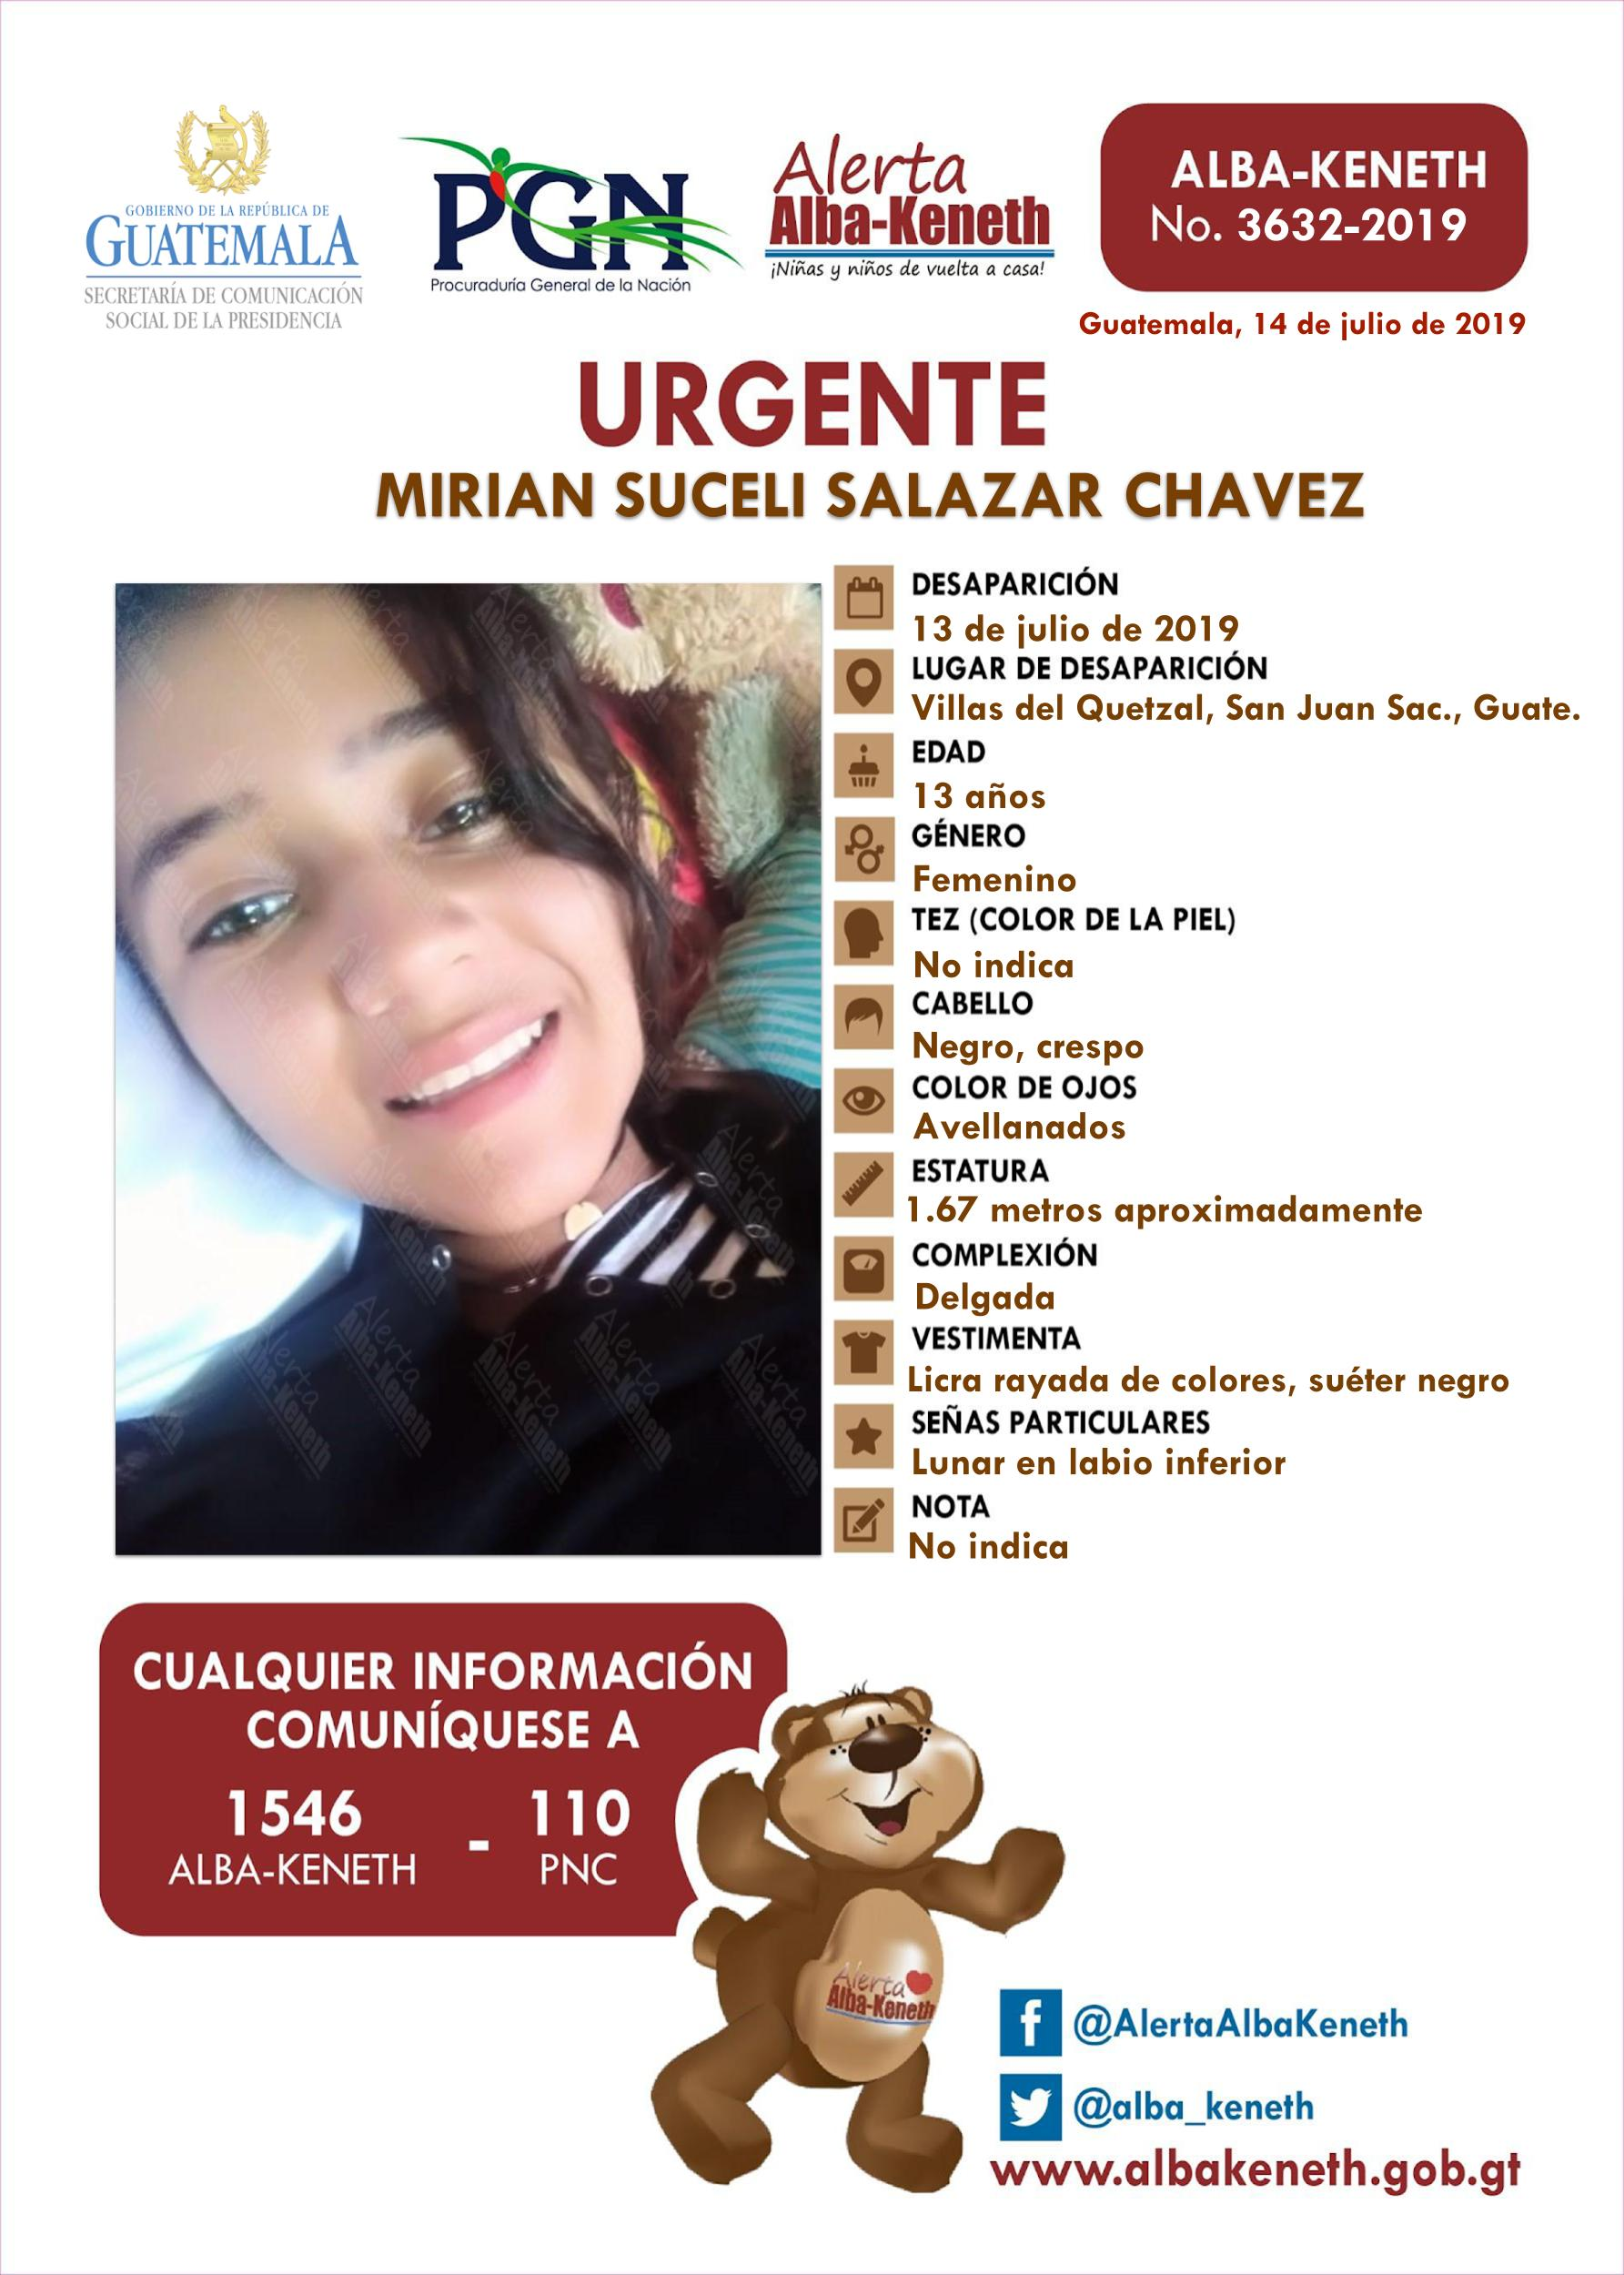 Miriam Suceli Salazar Chavez